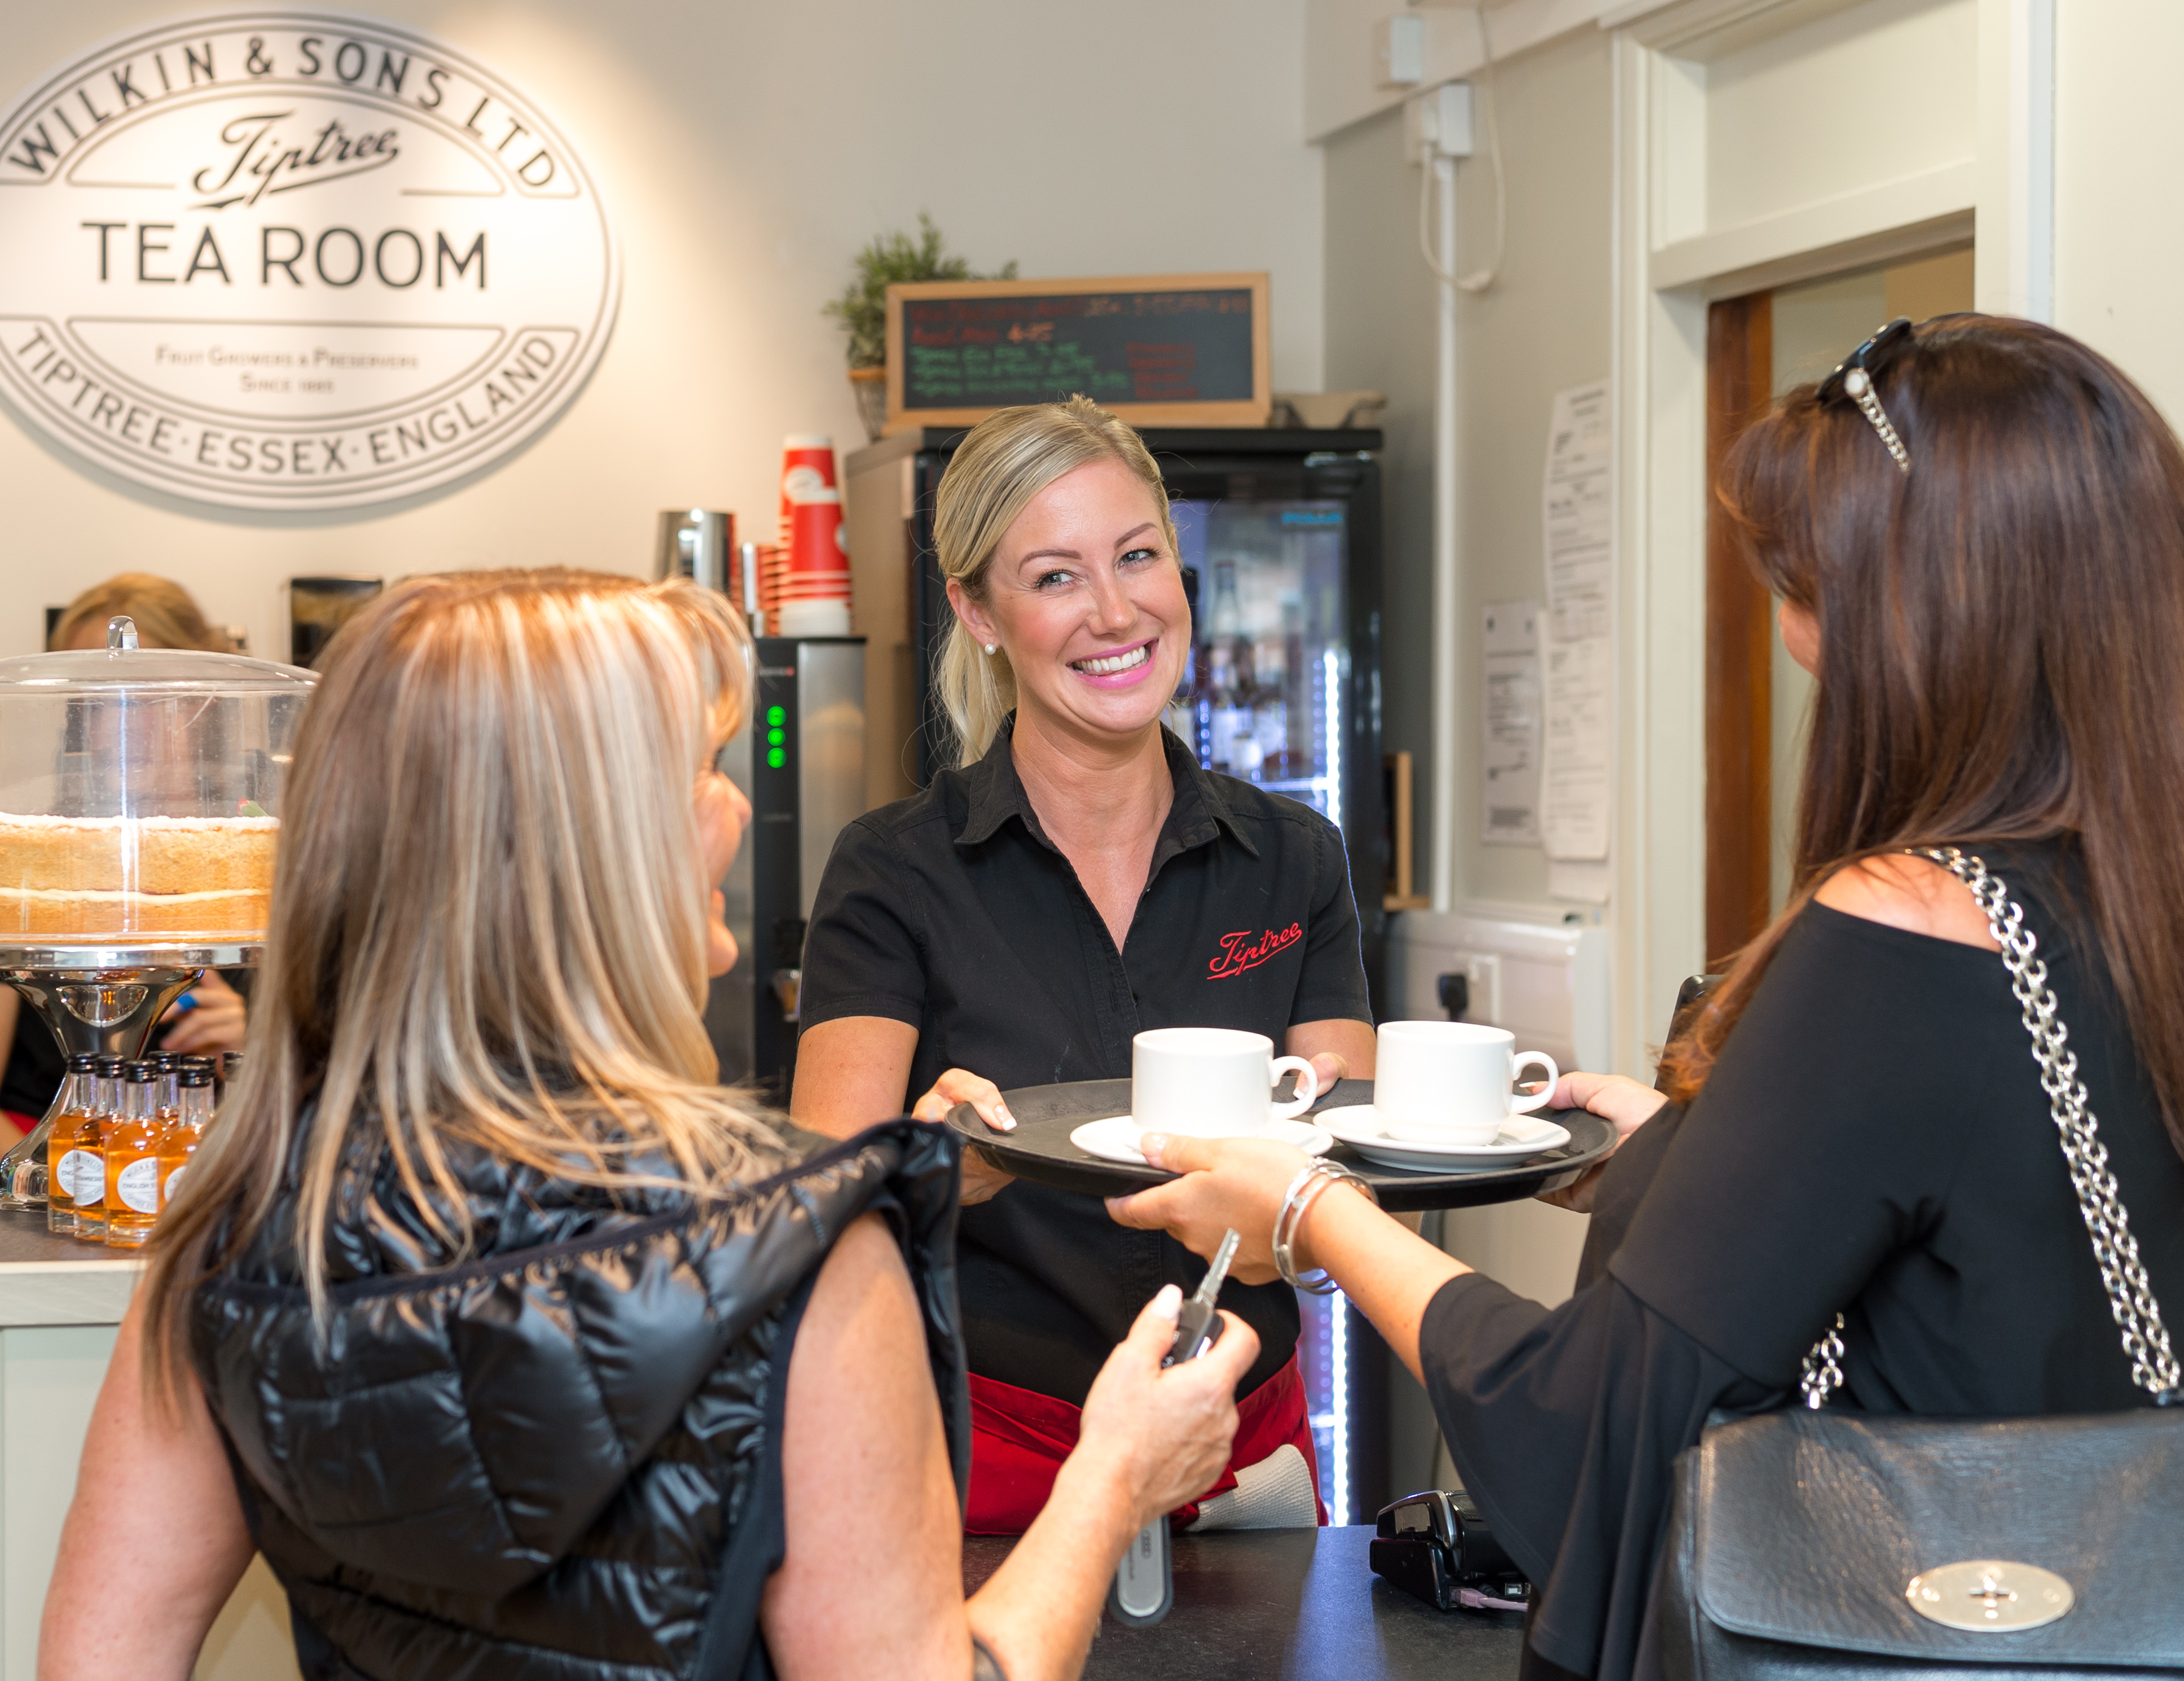 Afternoon Tea at Tiptree Tea Room and Café at Barleylands 1